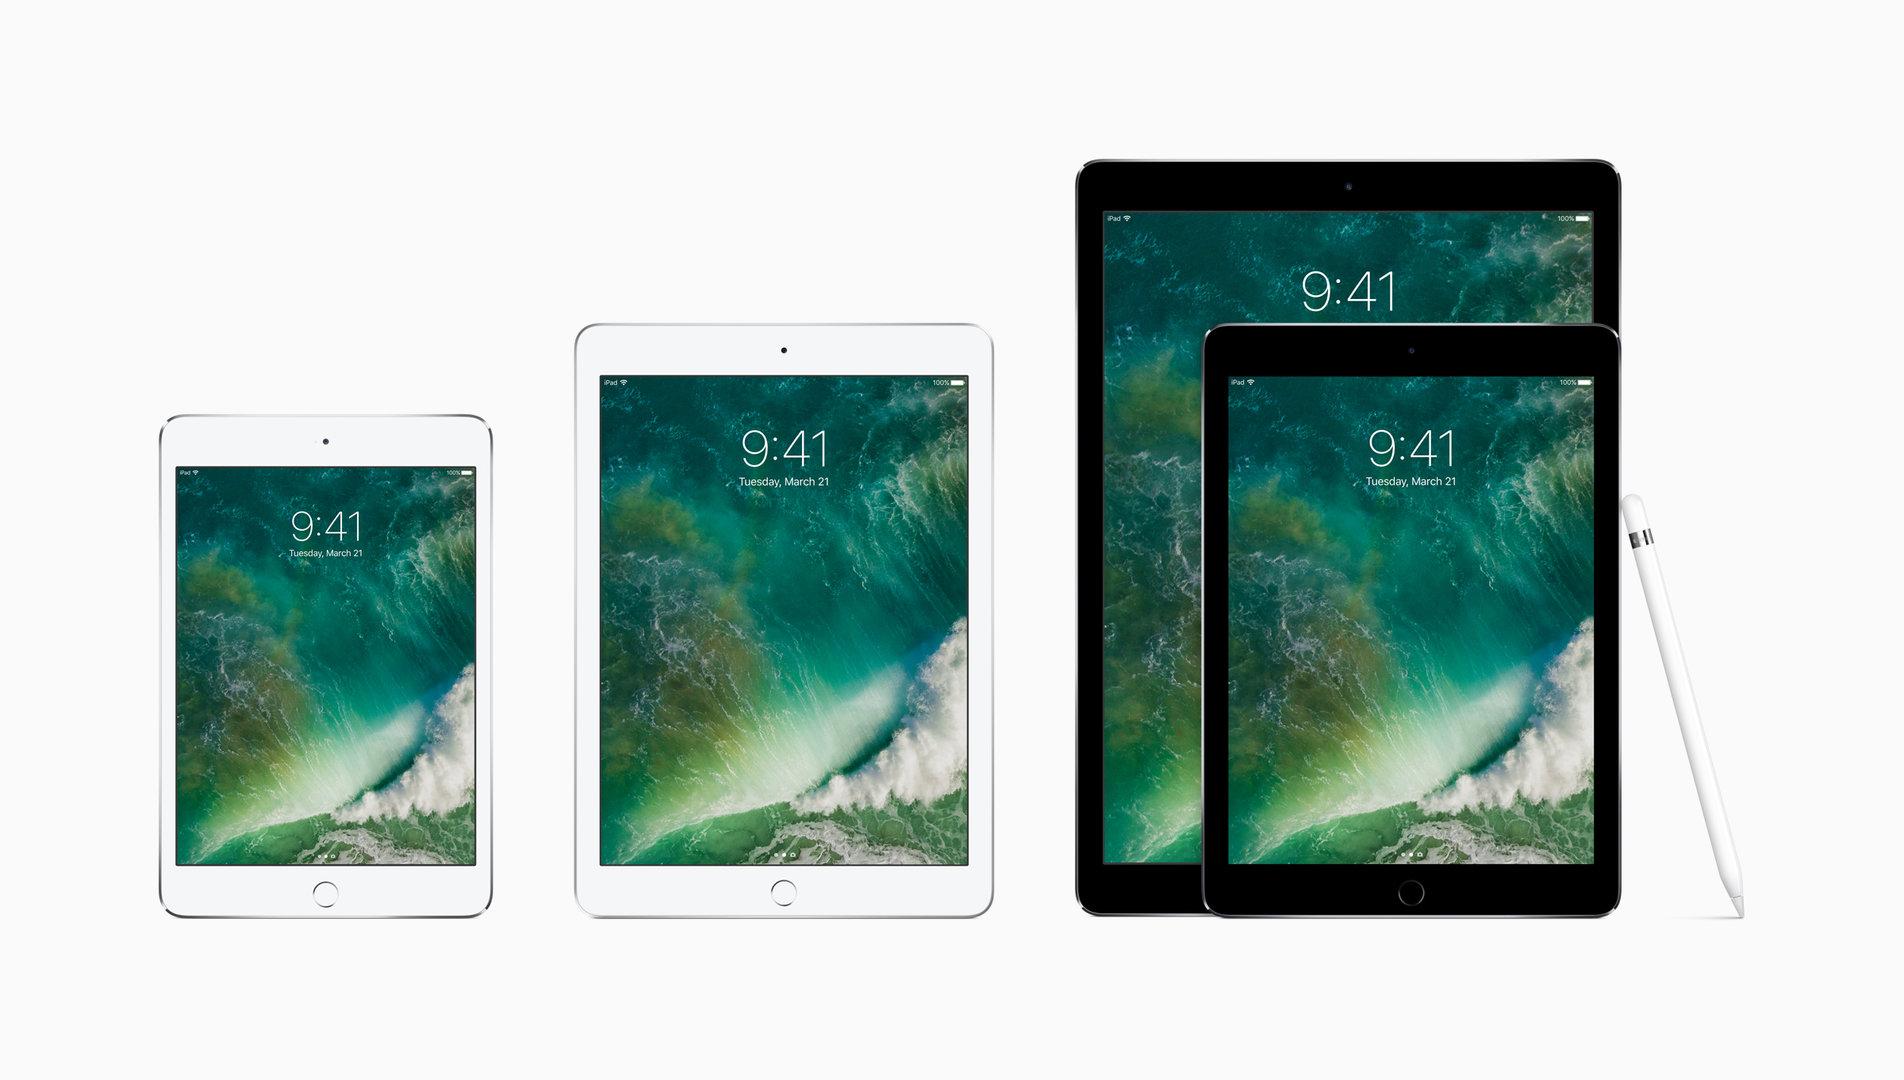 apple stellt neues ipad mit 9 7 zoll vor hartware. Black Bedroom Furniture Sets. Home Design Ideas